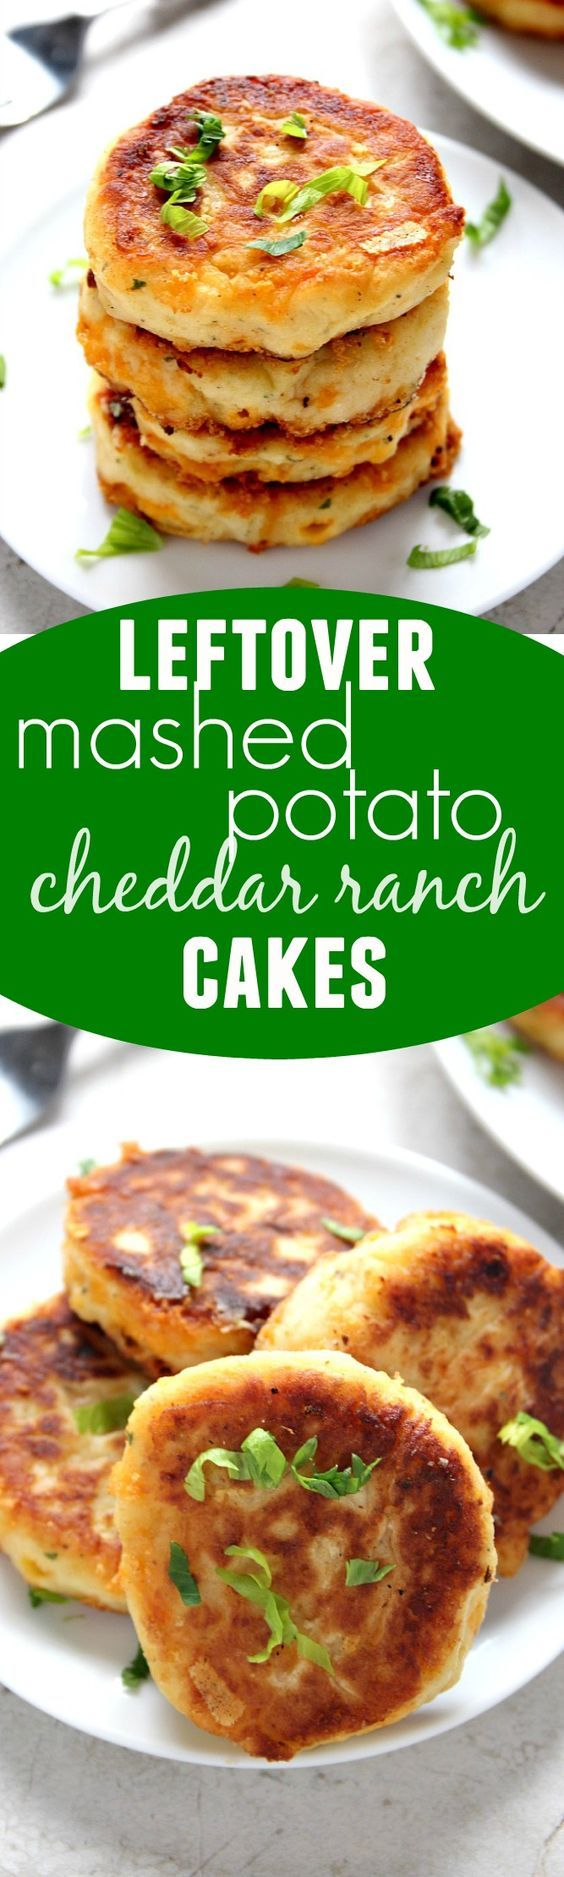 Leftover Mashed Potato Cheddar Ranch Cakes